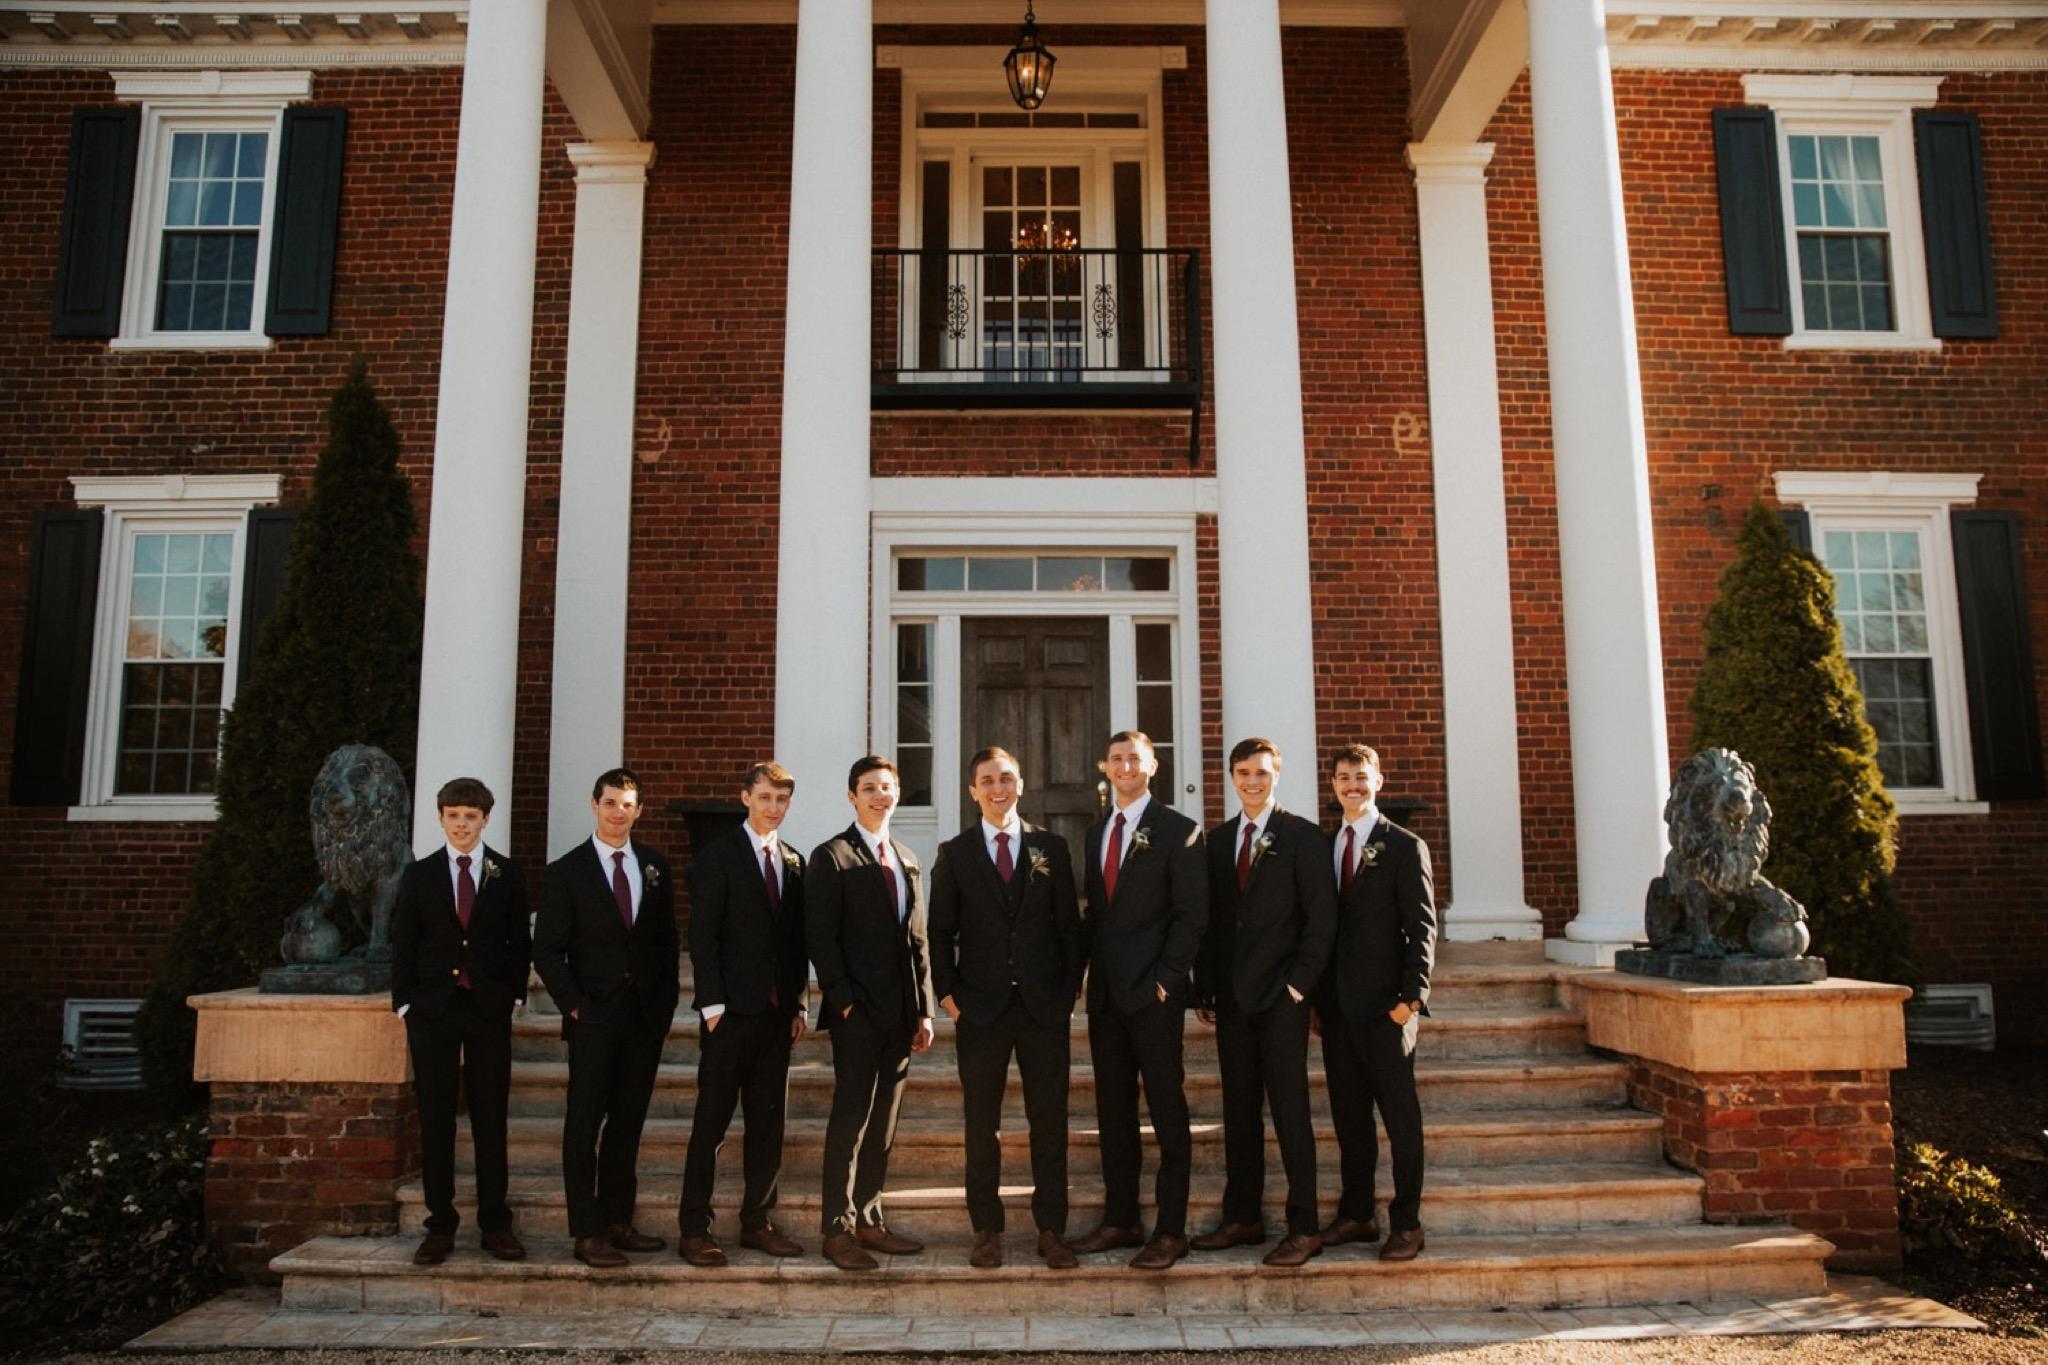 54_West Manor Estate Weddings - Pat Cori Photography-112_groomsmen_VirginiaWeddingPhotographer_WestManorEstate_Portraits_Wedding.jpg